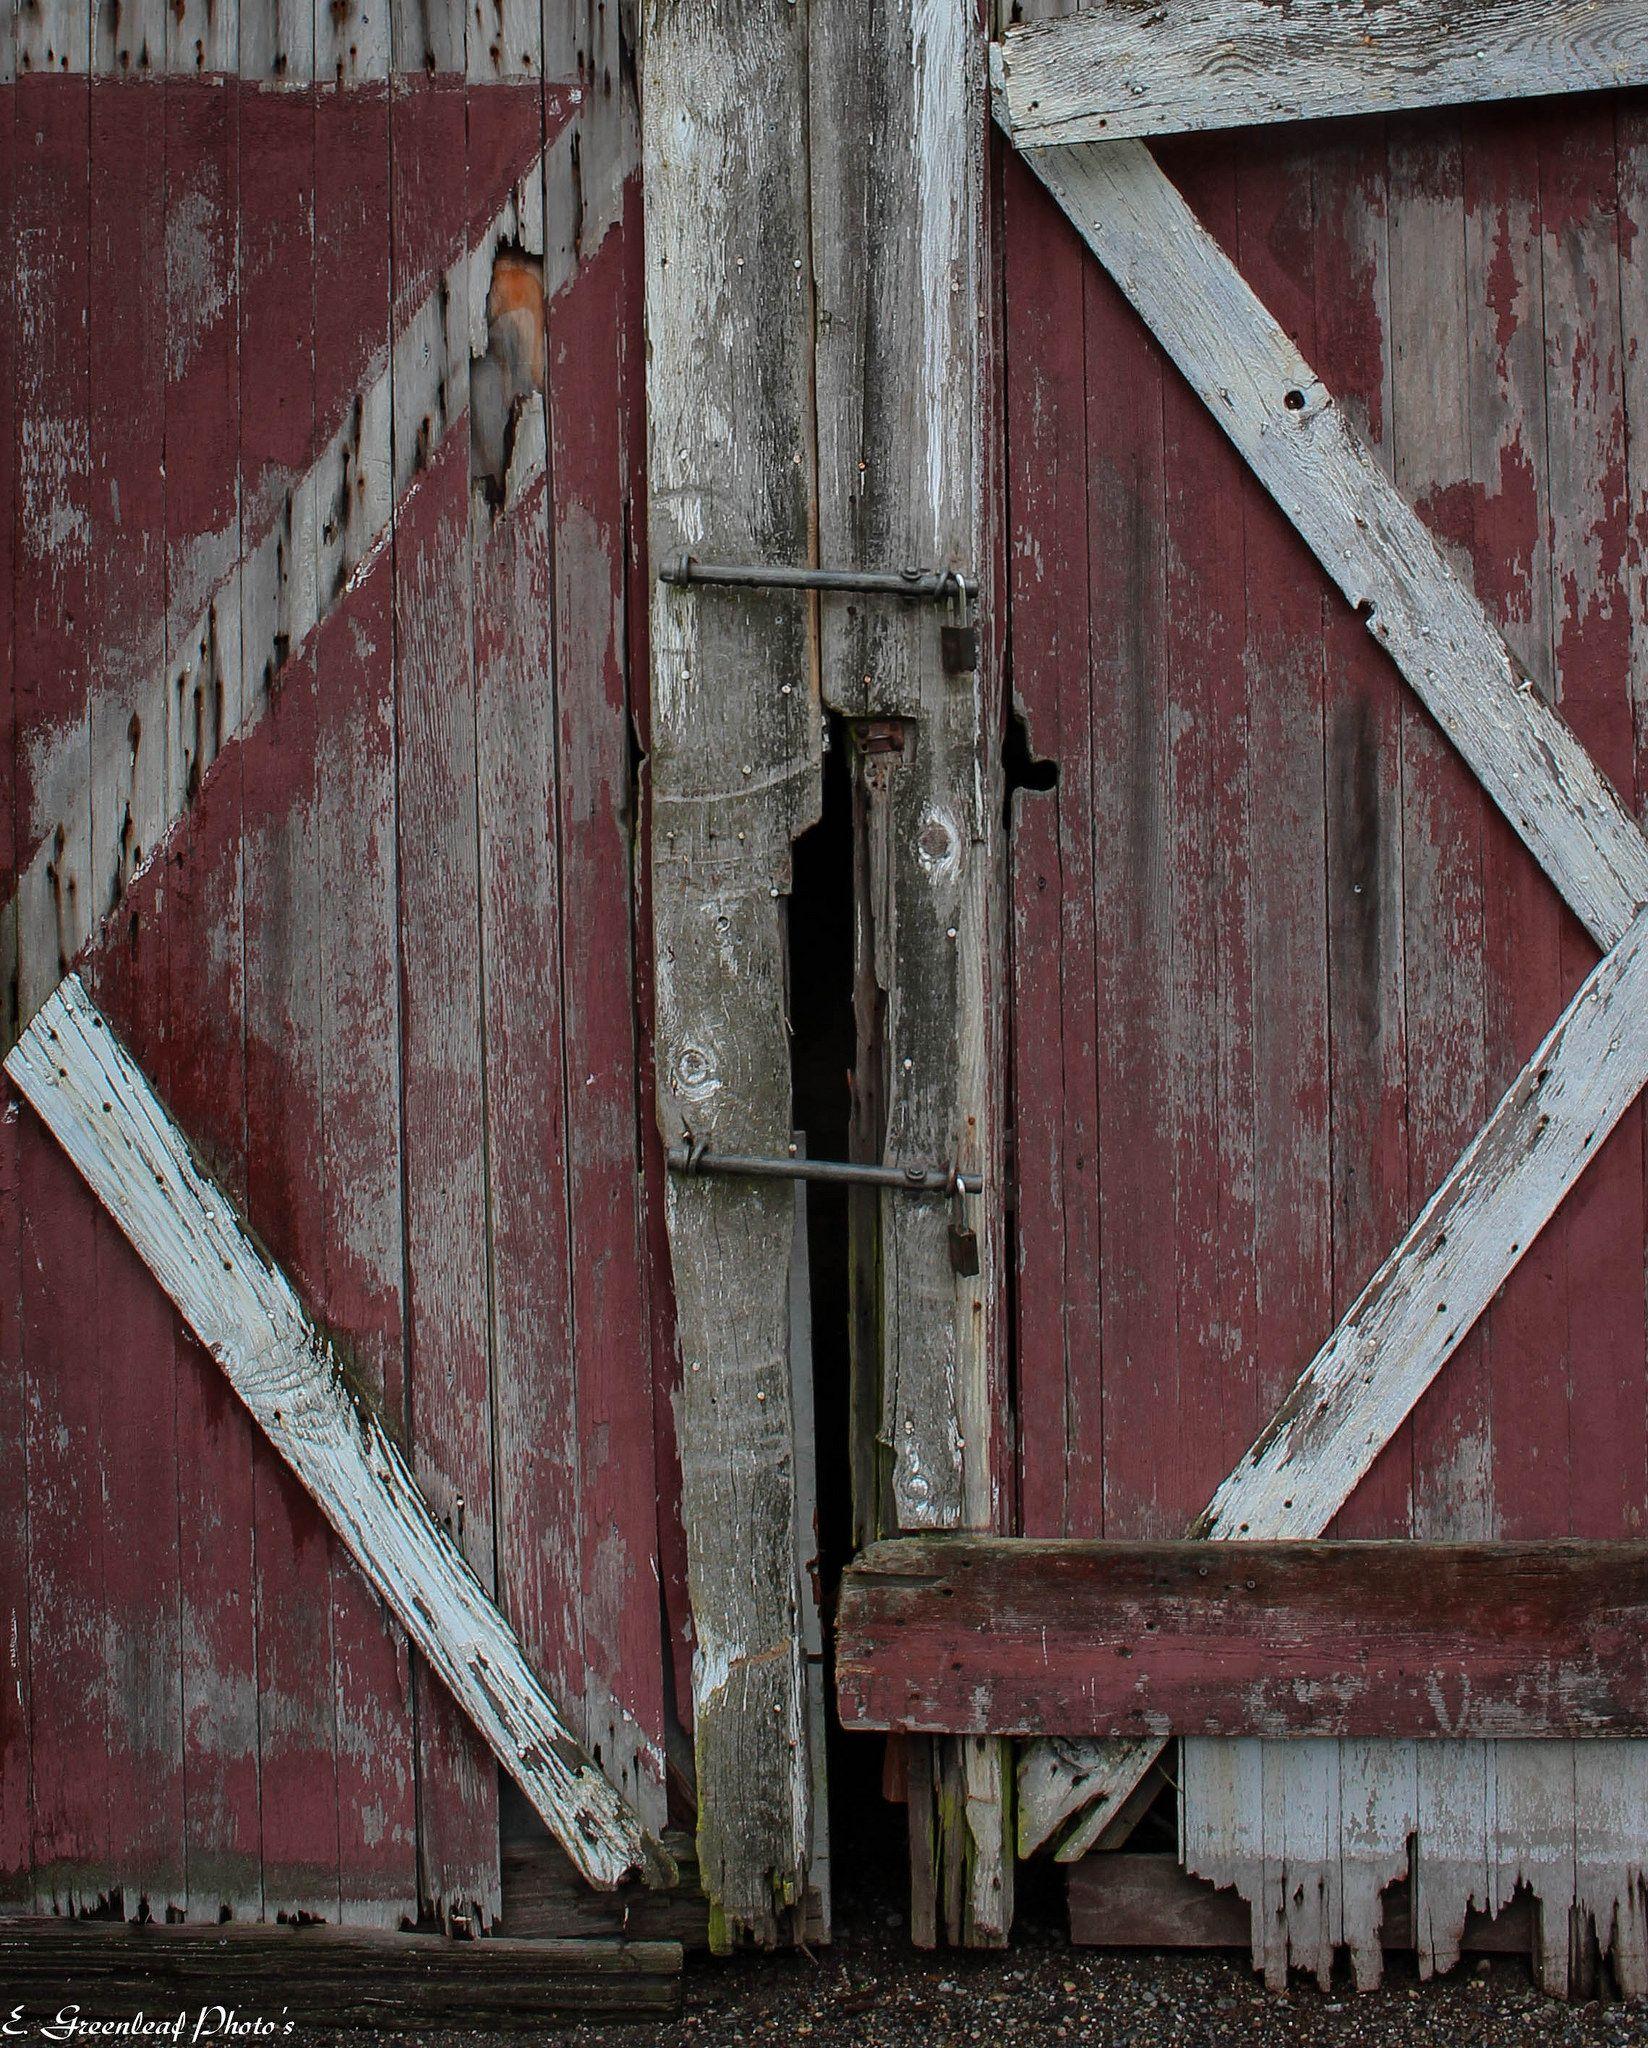 old barn Fort Steilacoom park wa   https://www.flickr.com/photos/132849904@N08/shares/mU94hq | estelle greenleaf's photos